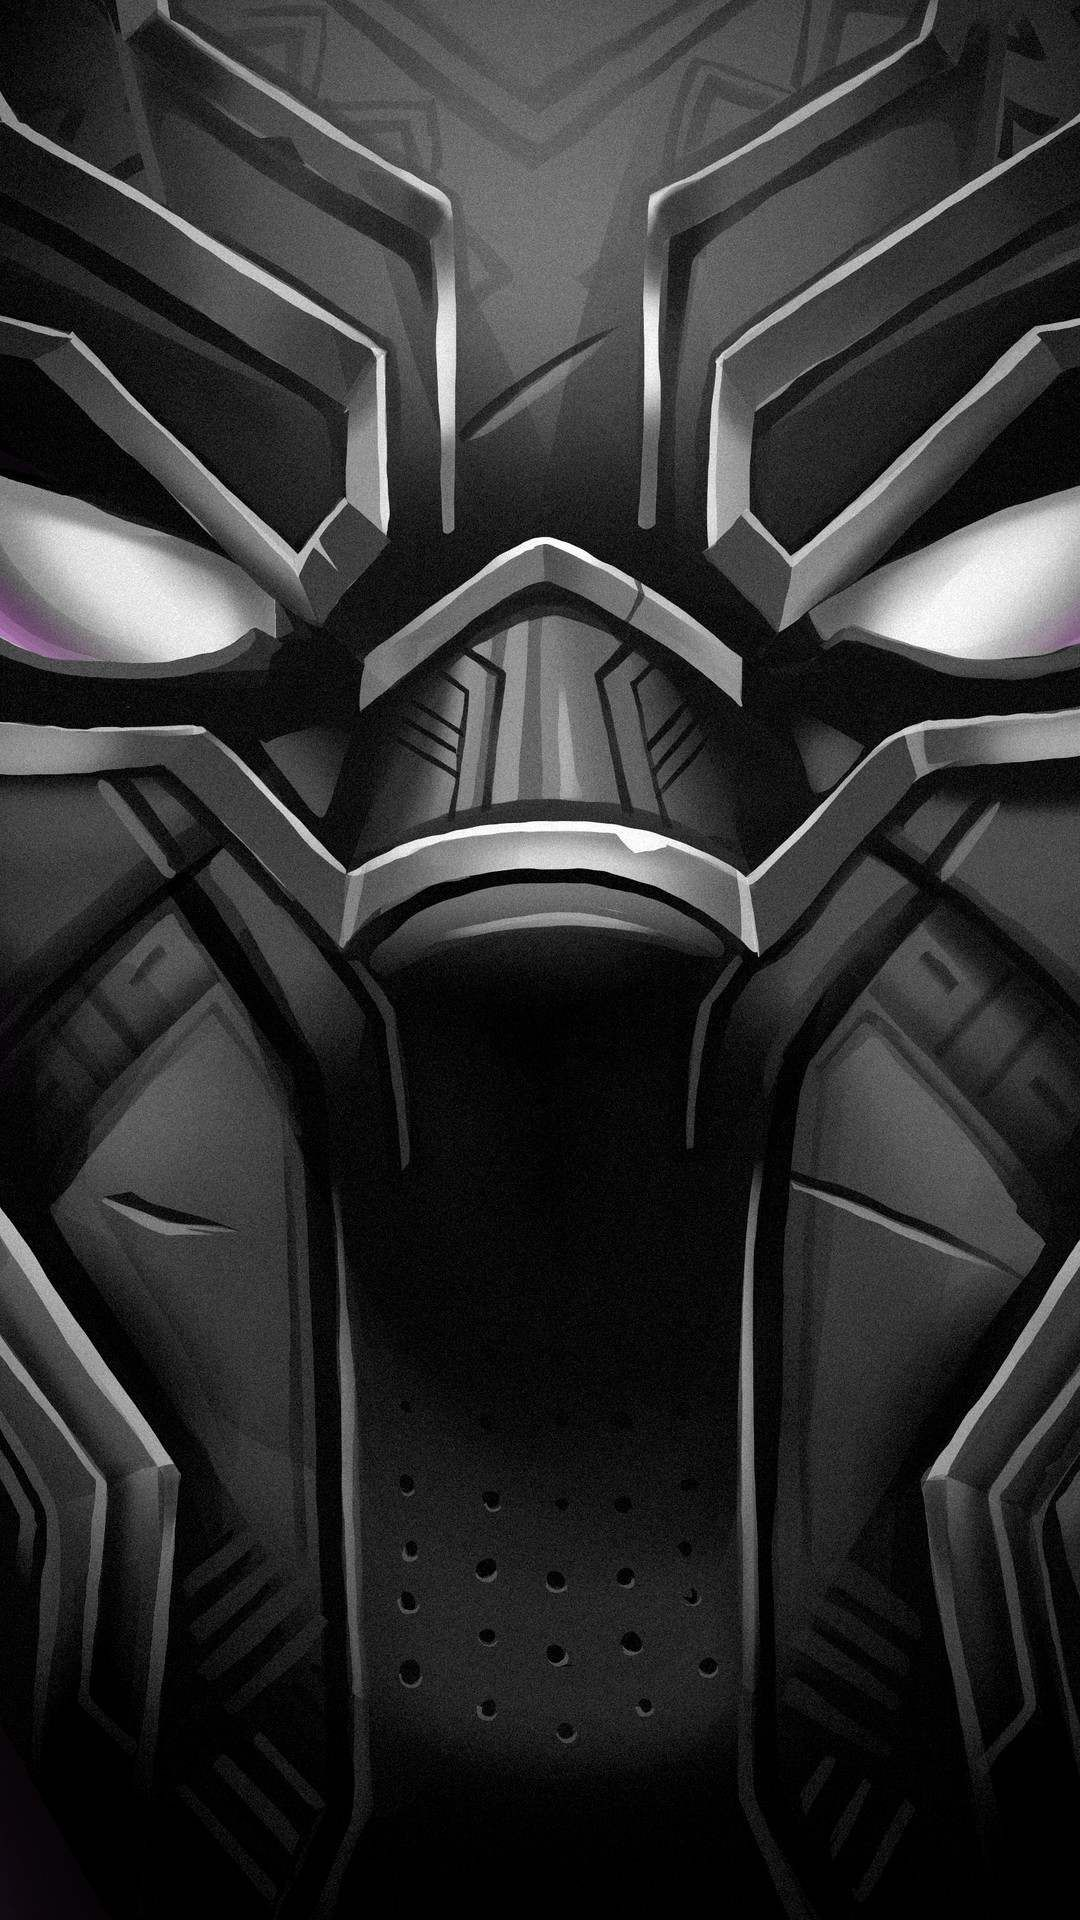 Black Panther Face iPhone Wallpaper Black panther face